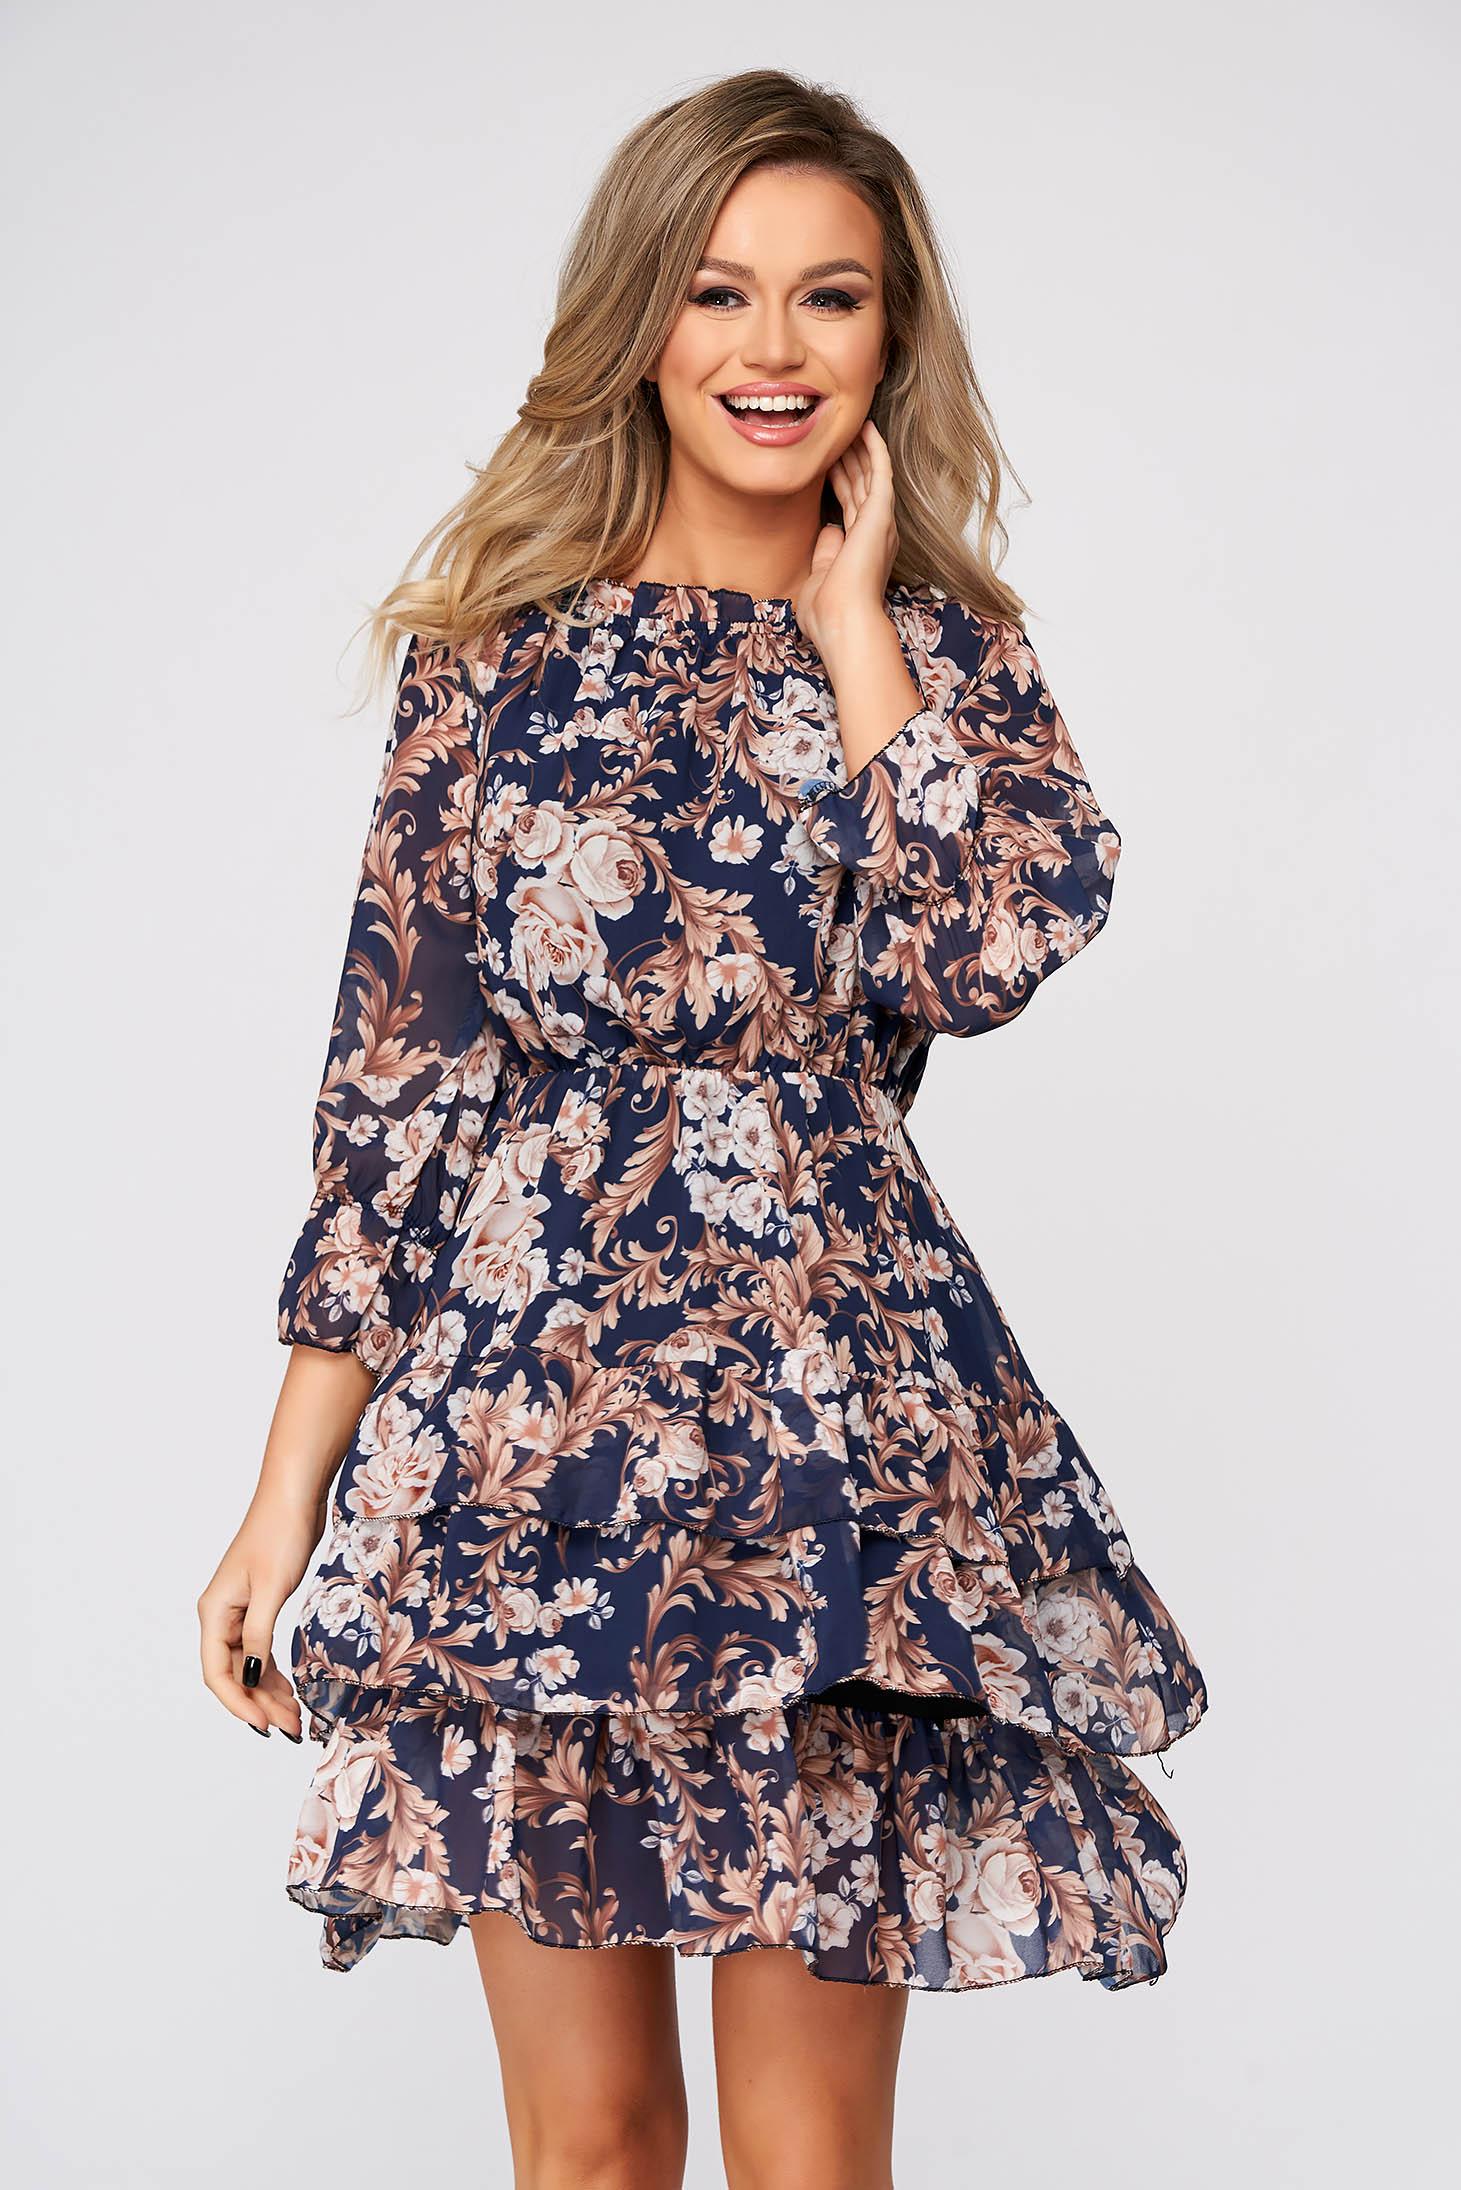 Dress short cut daily thin fabric off-shoulder